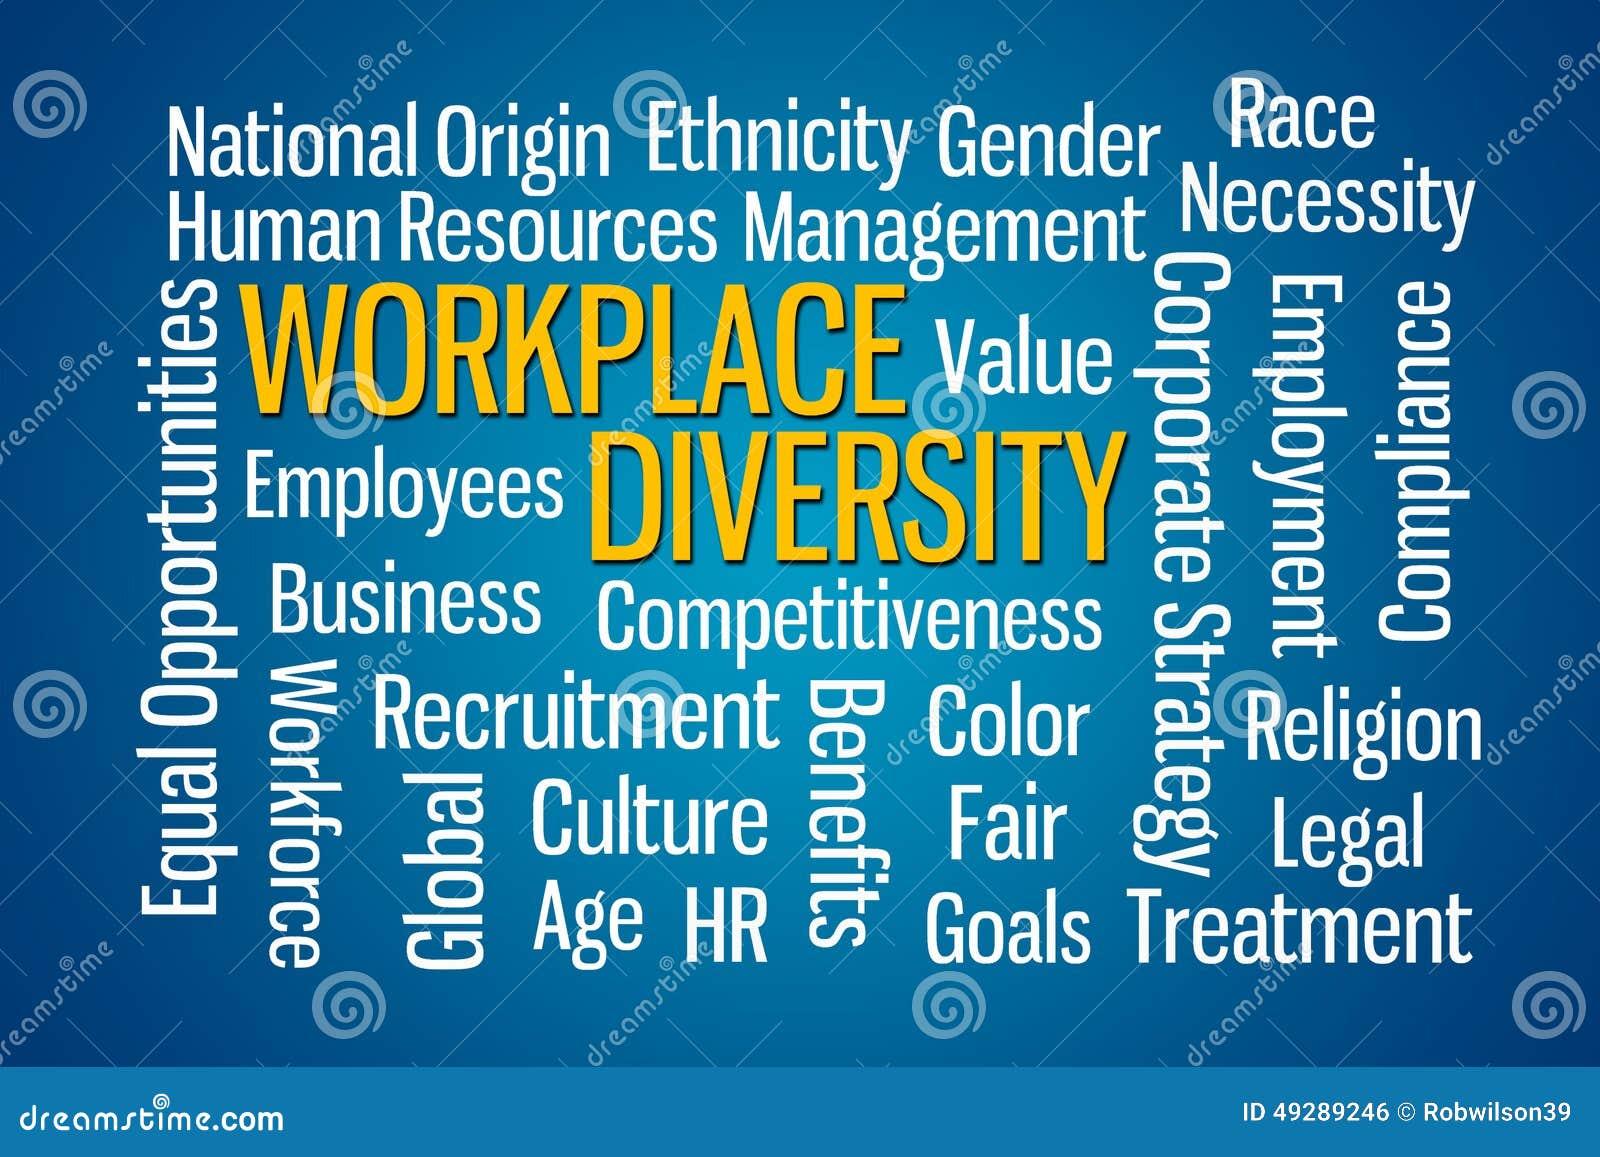 Workplace Diversity Stock Illustration - Image: 49289246